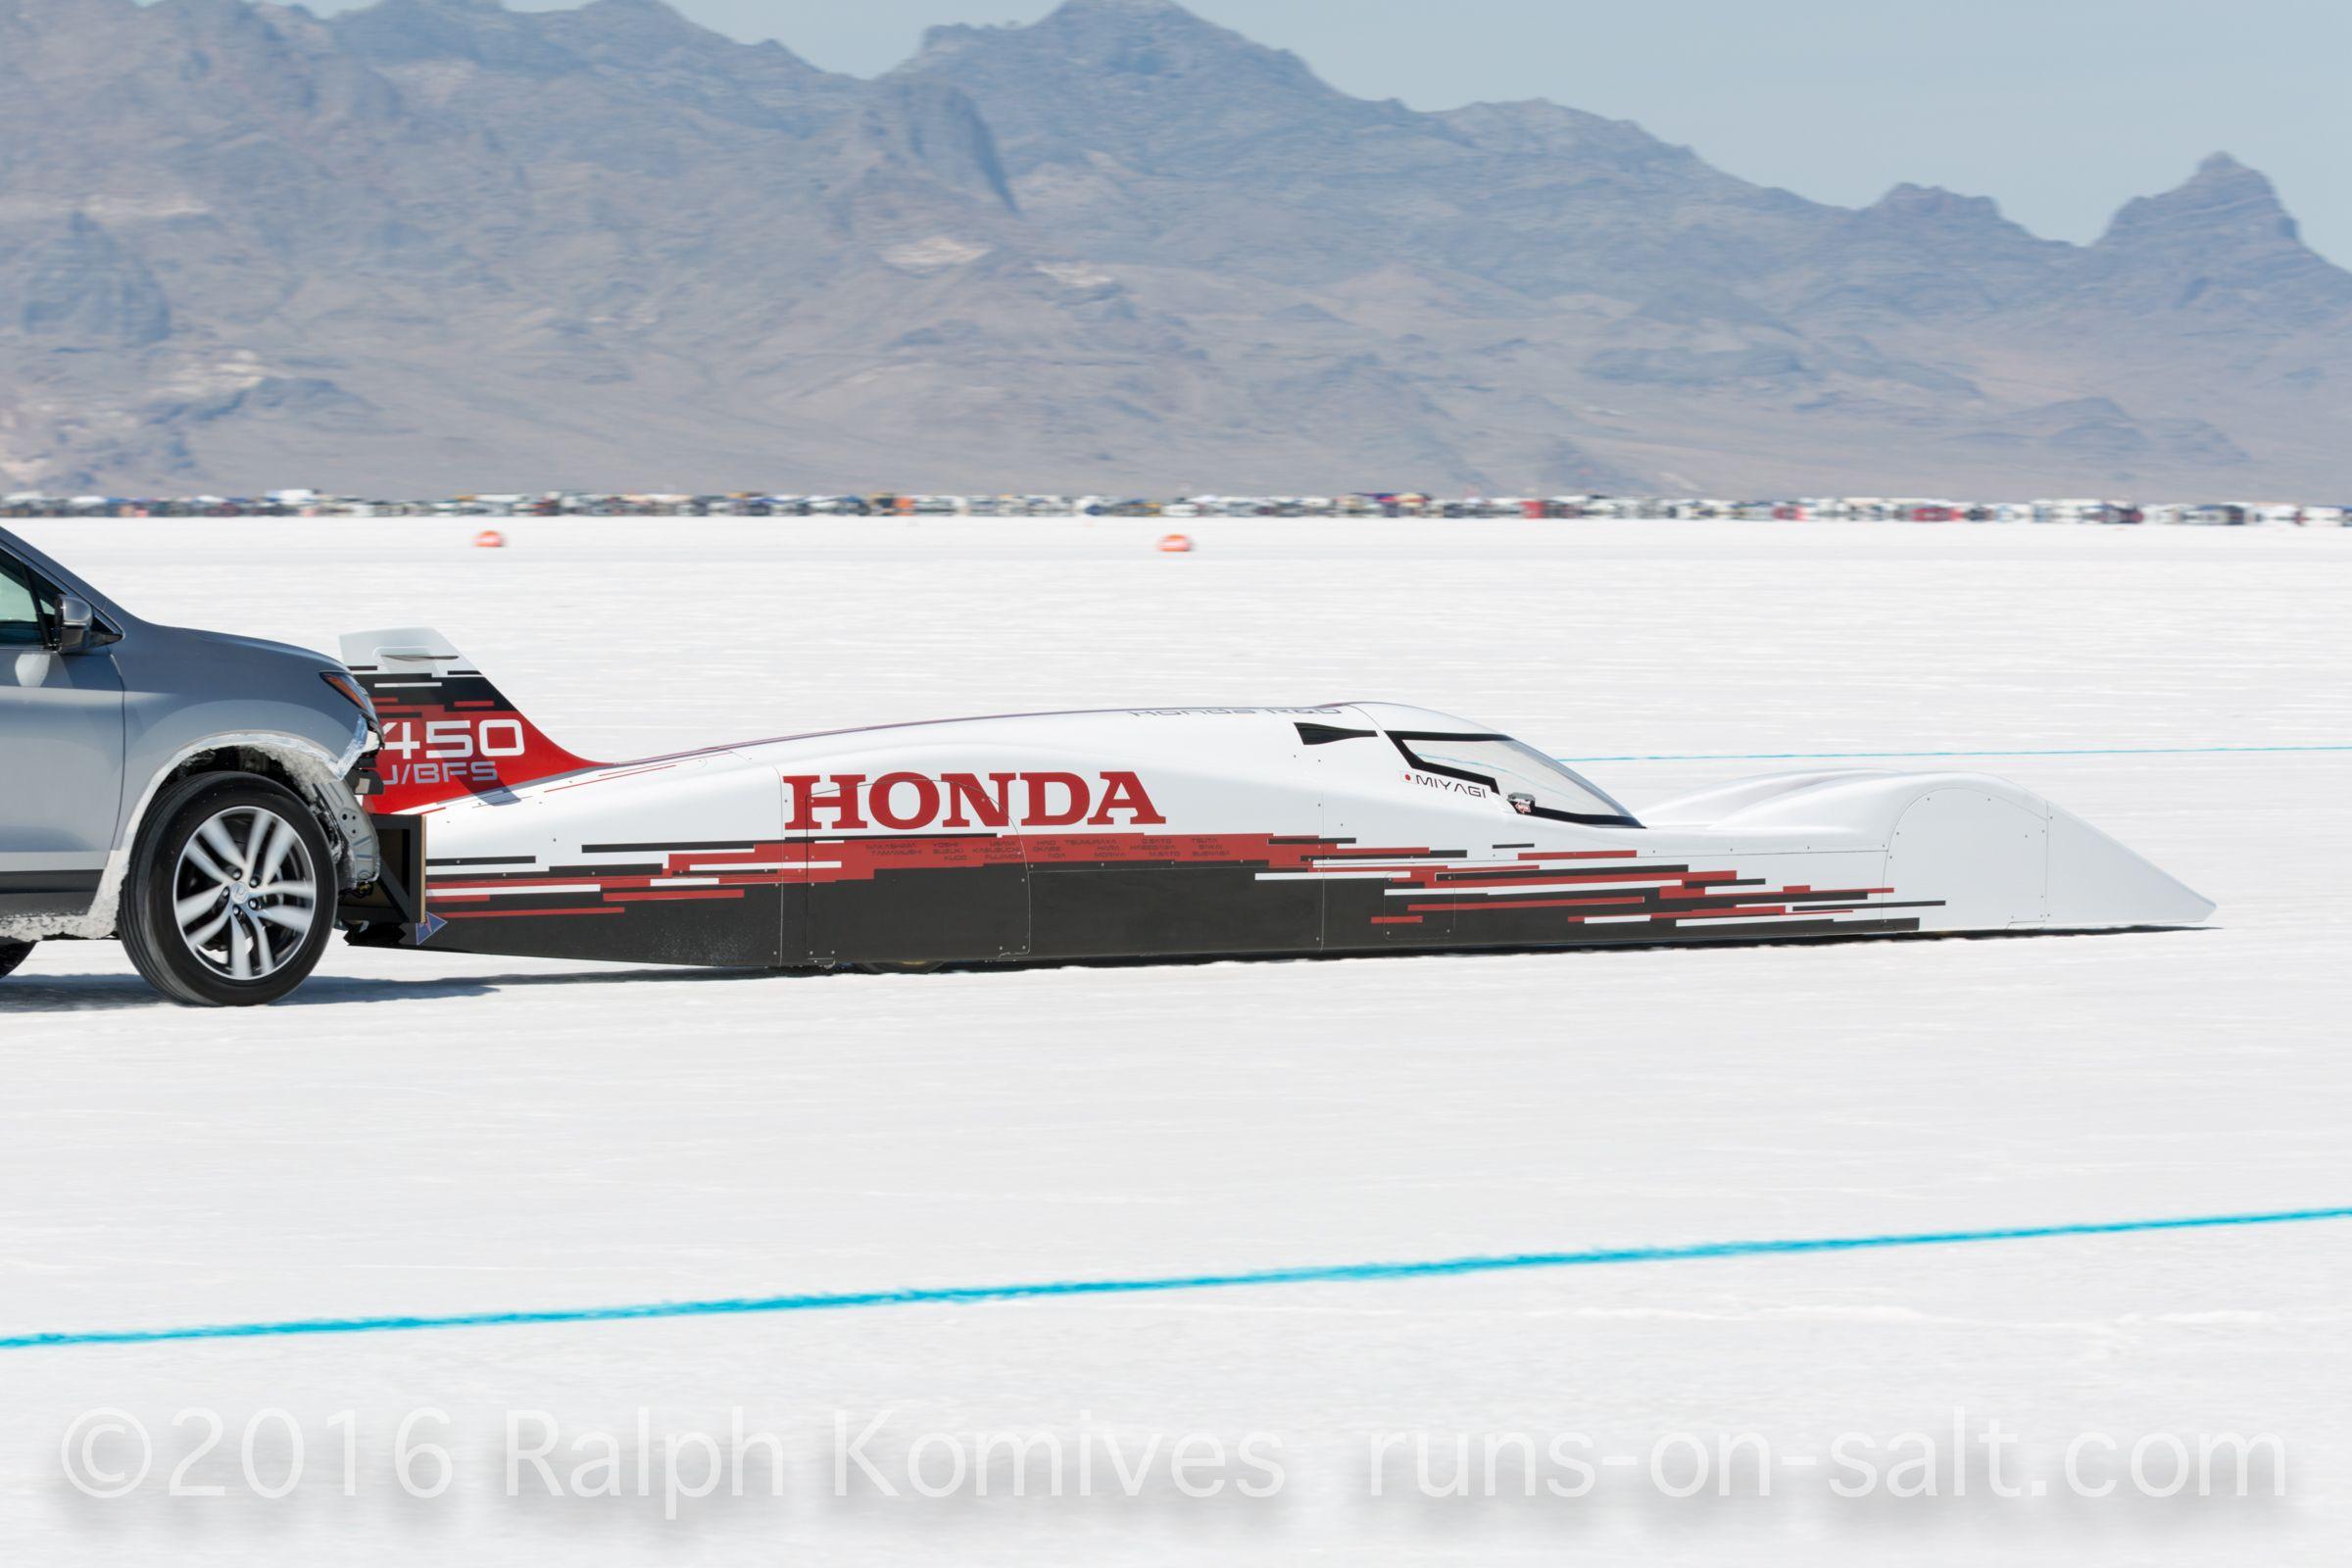 450 2016 J Bfs Honda Streamliner The Scta Engine Class Schedule Includes Sizes Aa Thru K The Large Bonneville Classic Motorcycles Bonneville Salt Flats